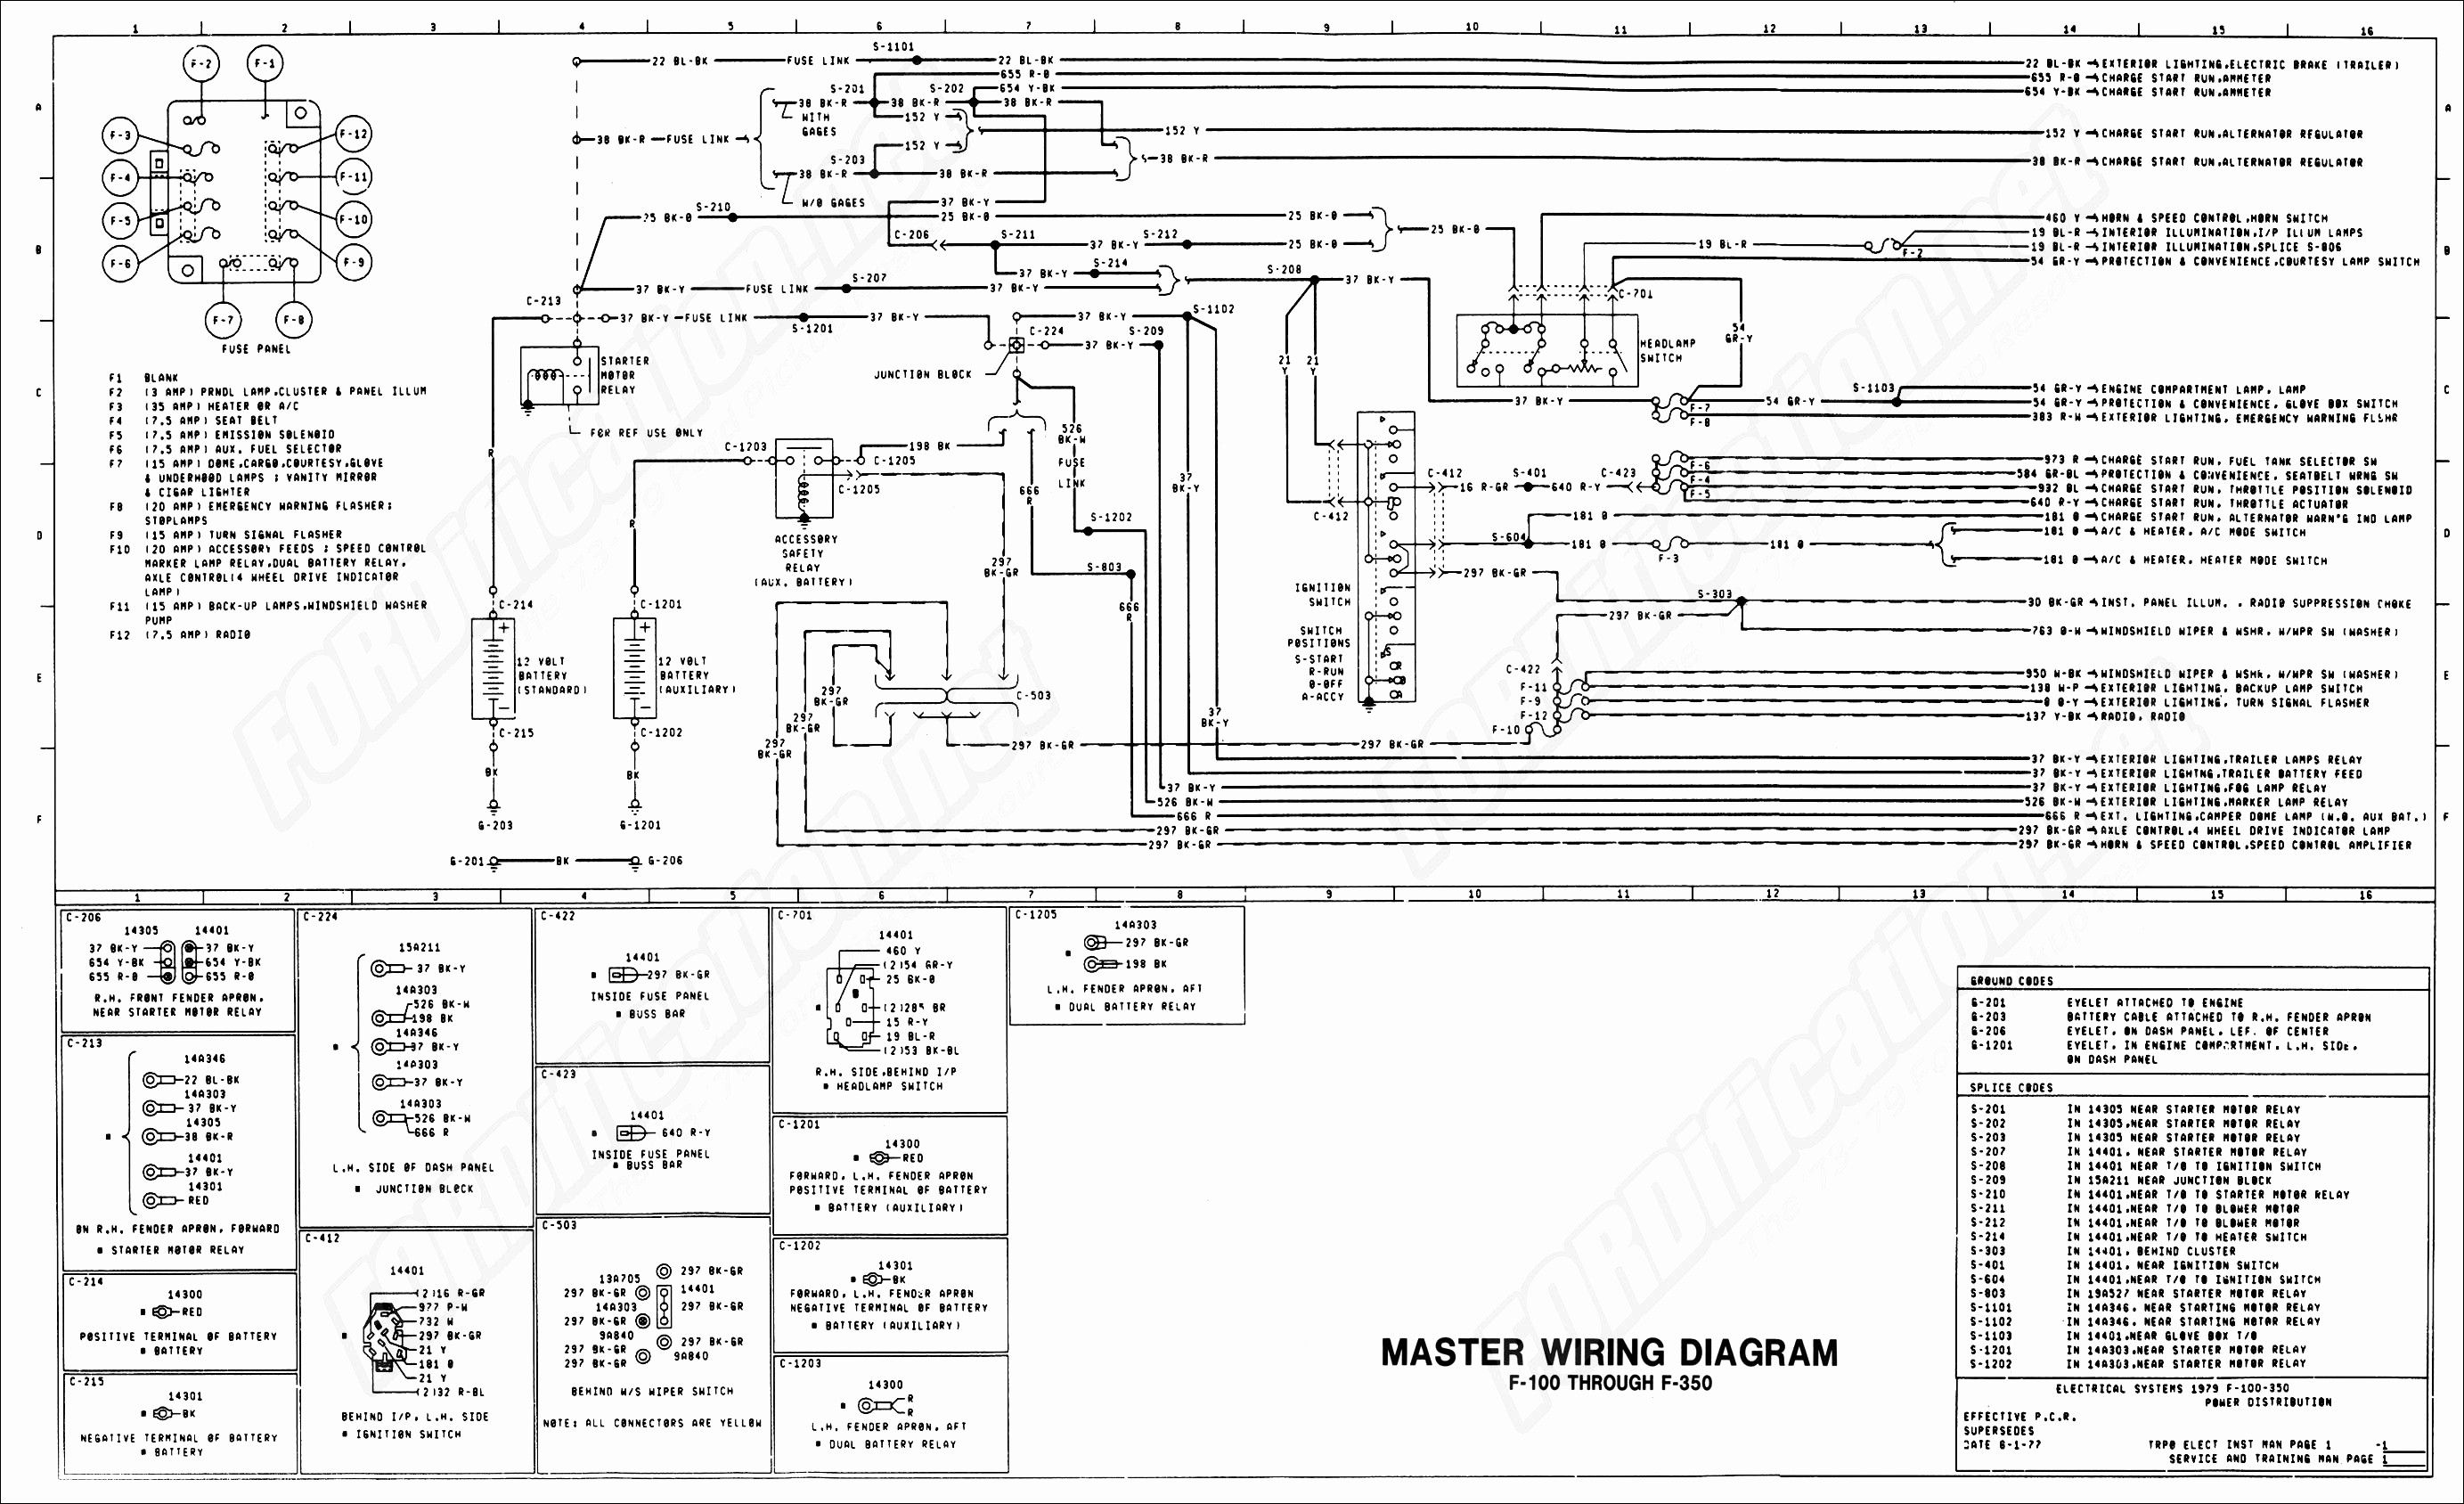 Sony Xplod 52wx4 Wiring Diagram In 2020 Sterling Trucks Diagram Fuse Box